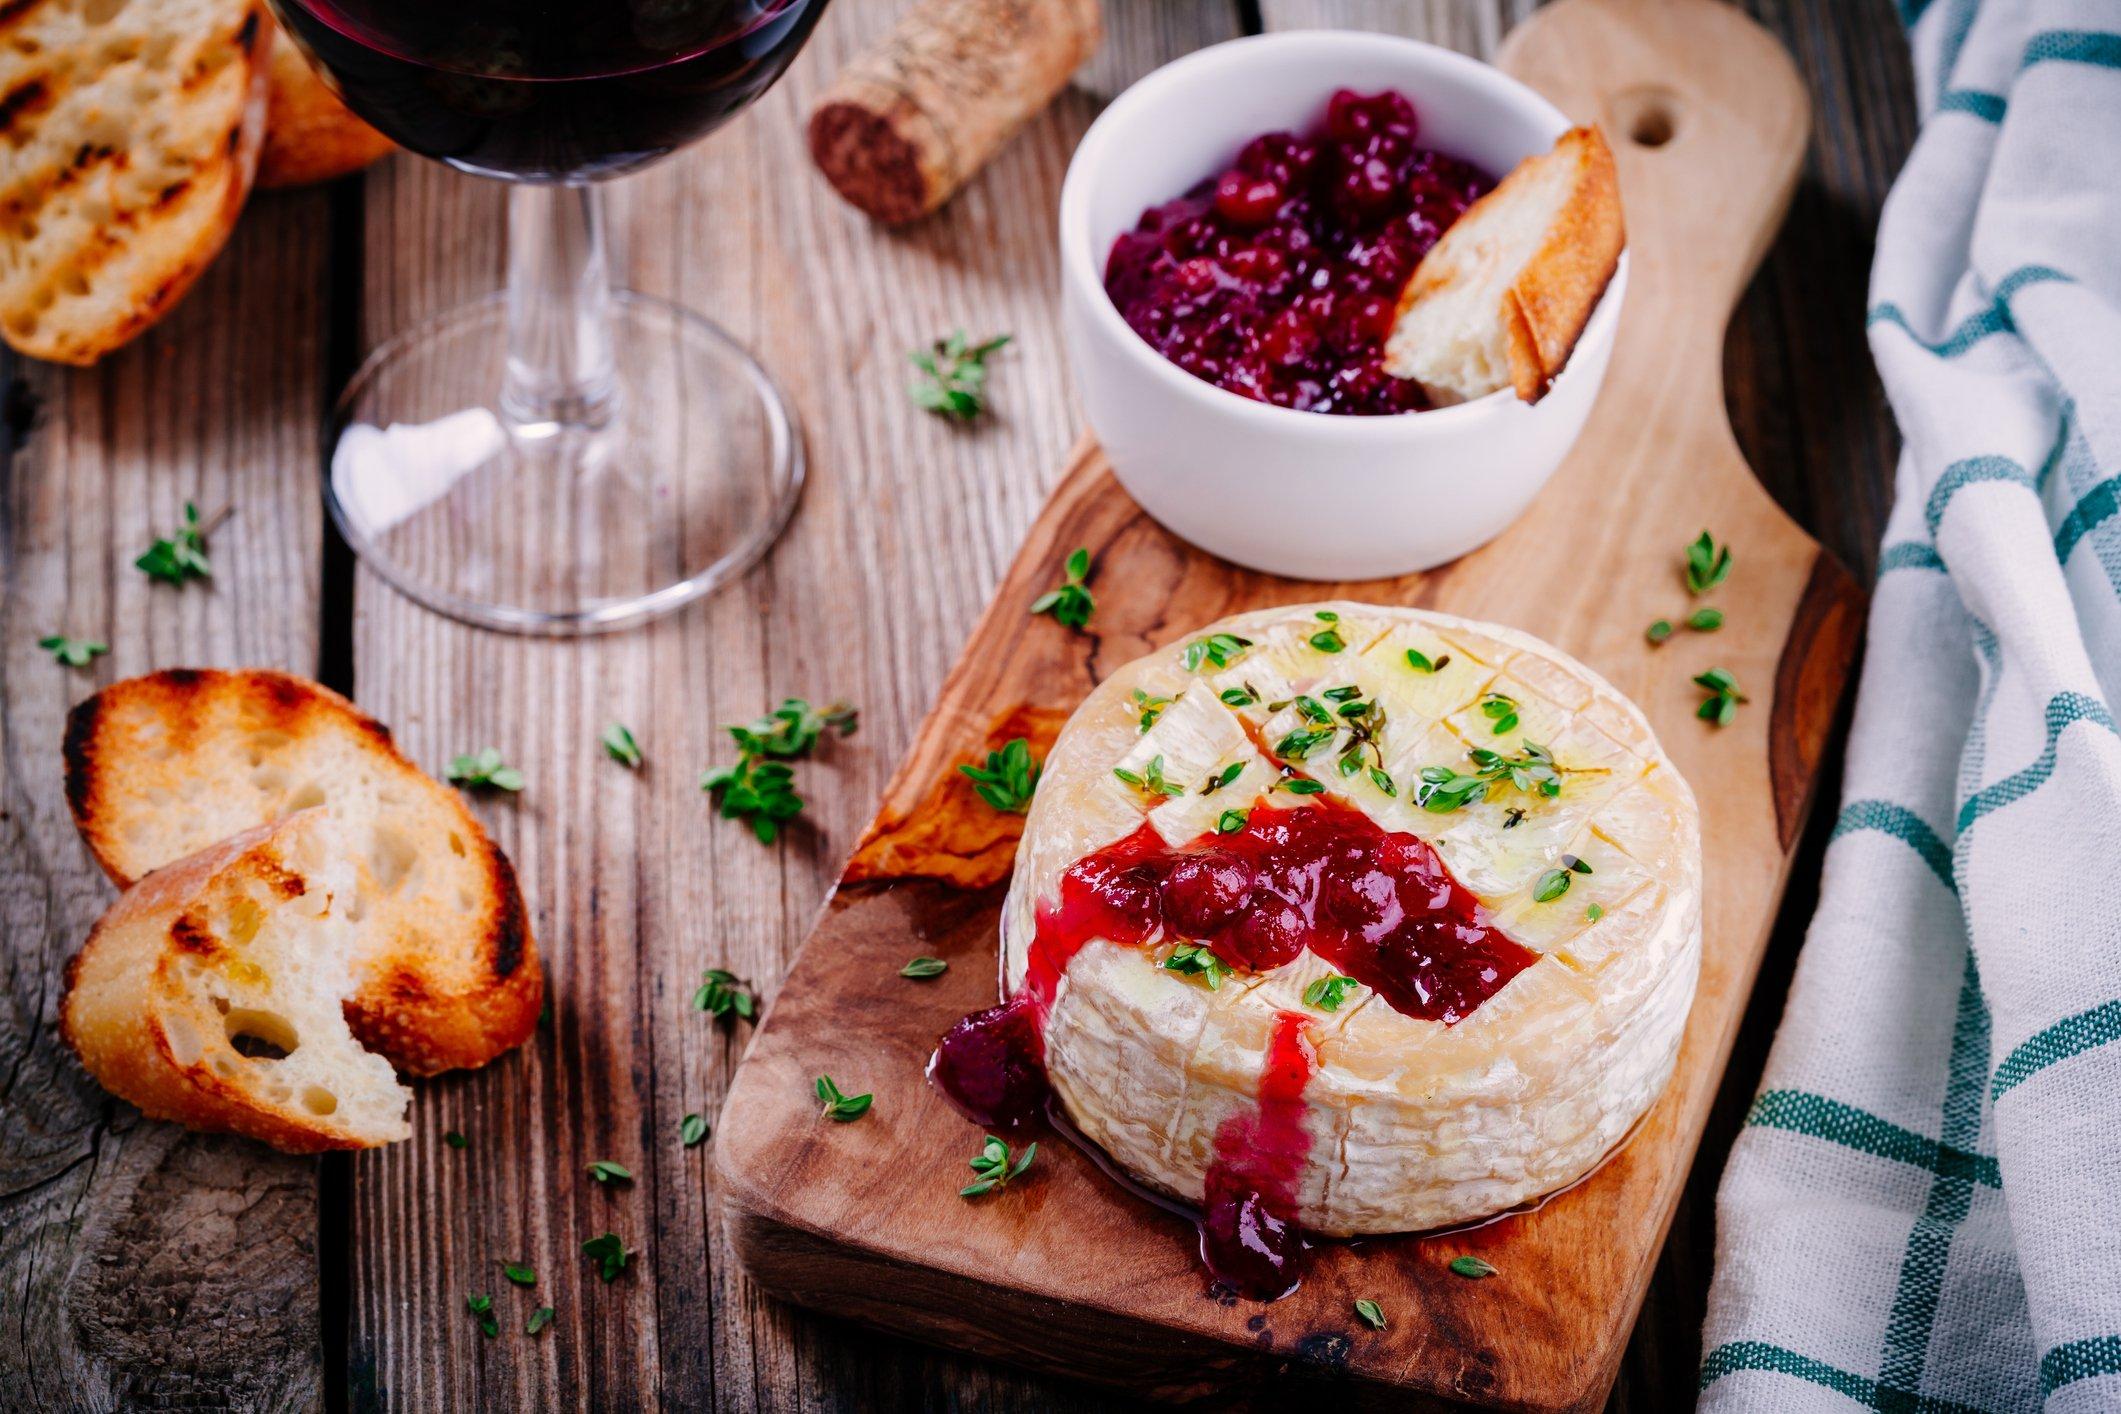 Vegetarisches Weihnachtsessen: Gebackener Camembert